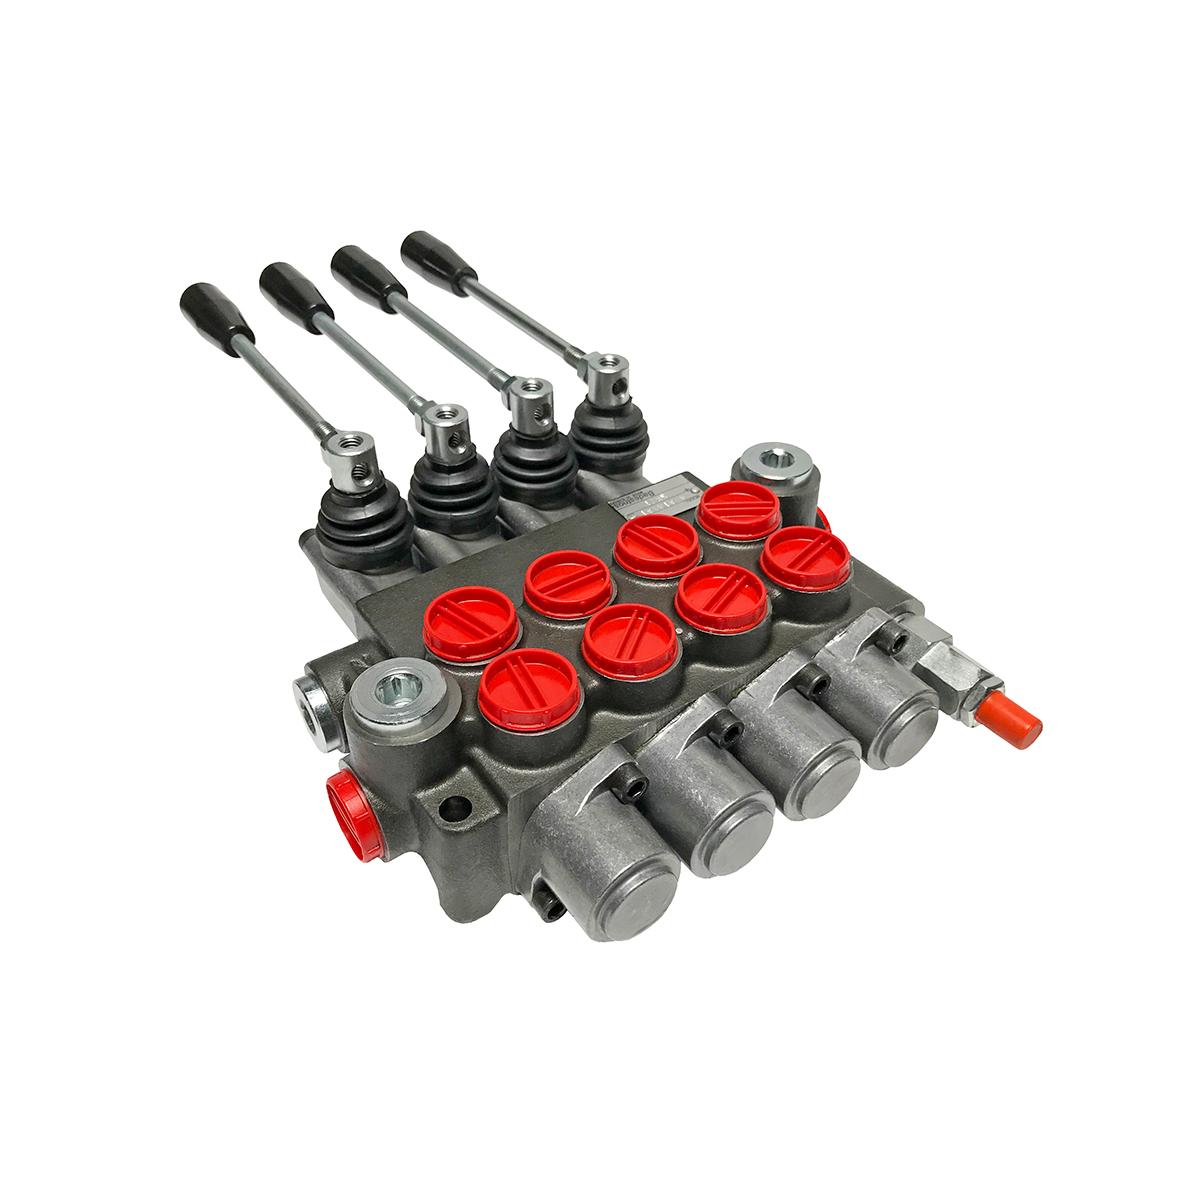 4 spool x 13 GPM hydraulic control valve, monoblock cast iron valve | Magister Hydraulics